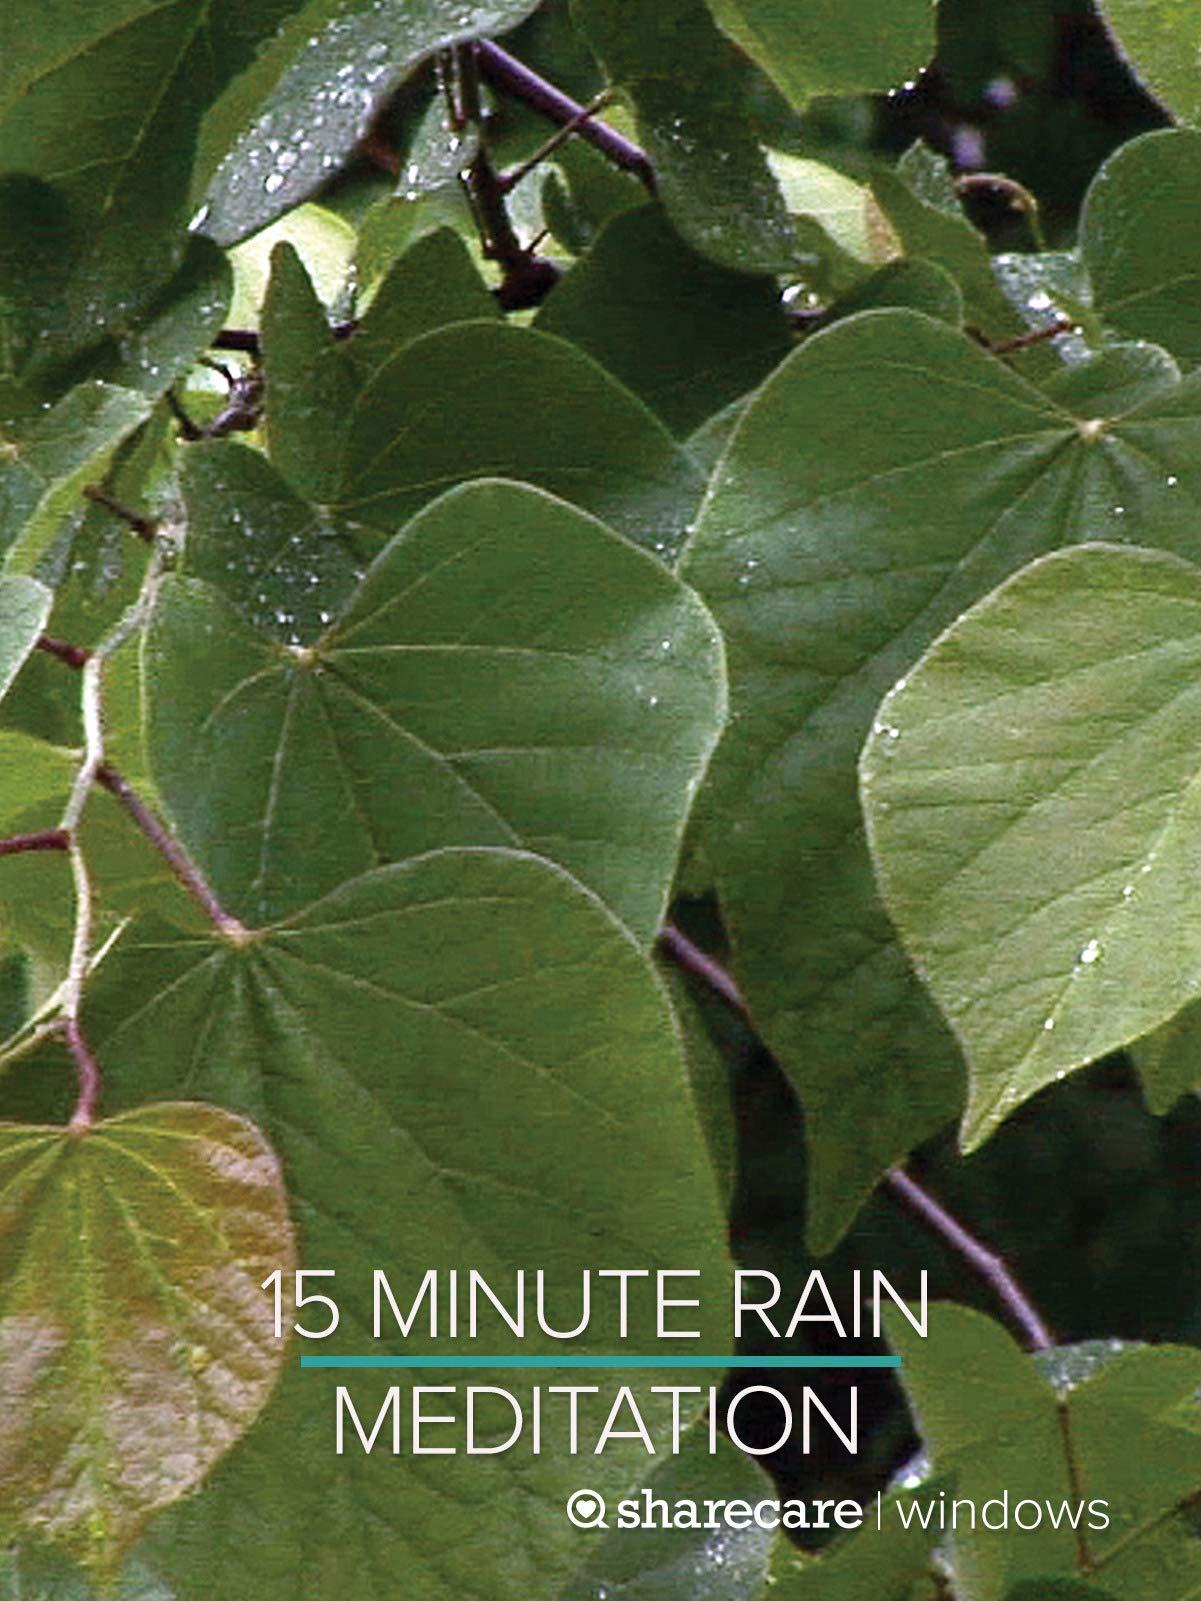 15 Minute Rain Meditation